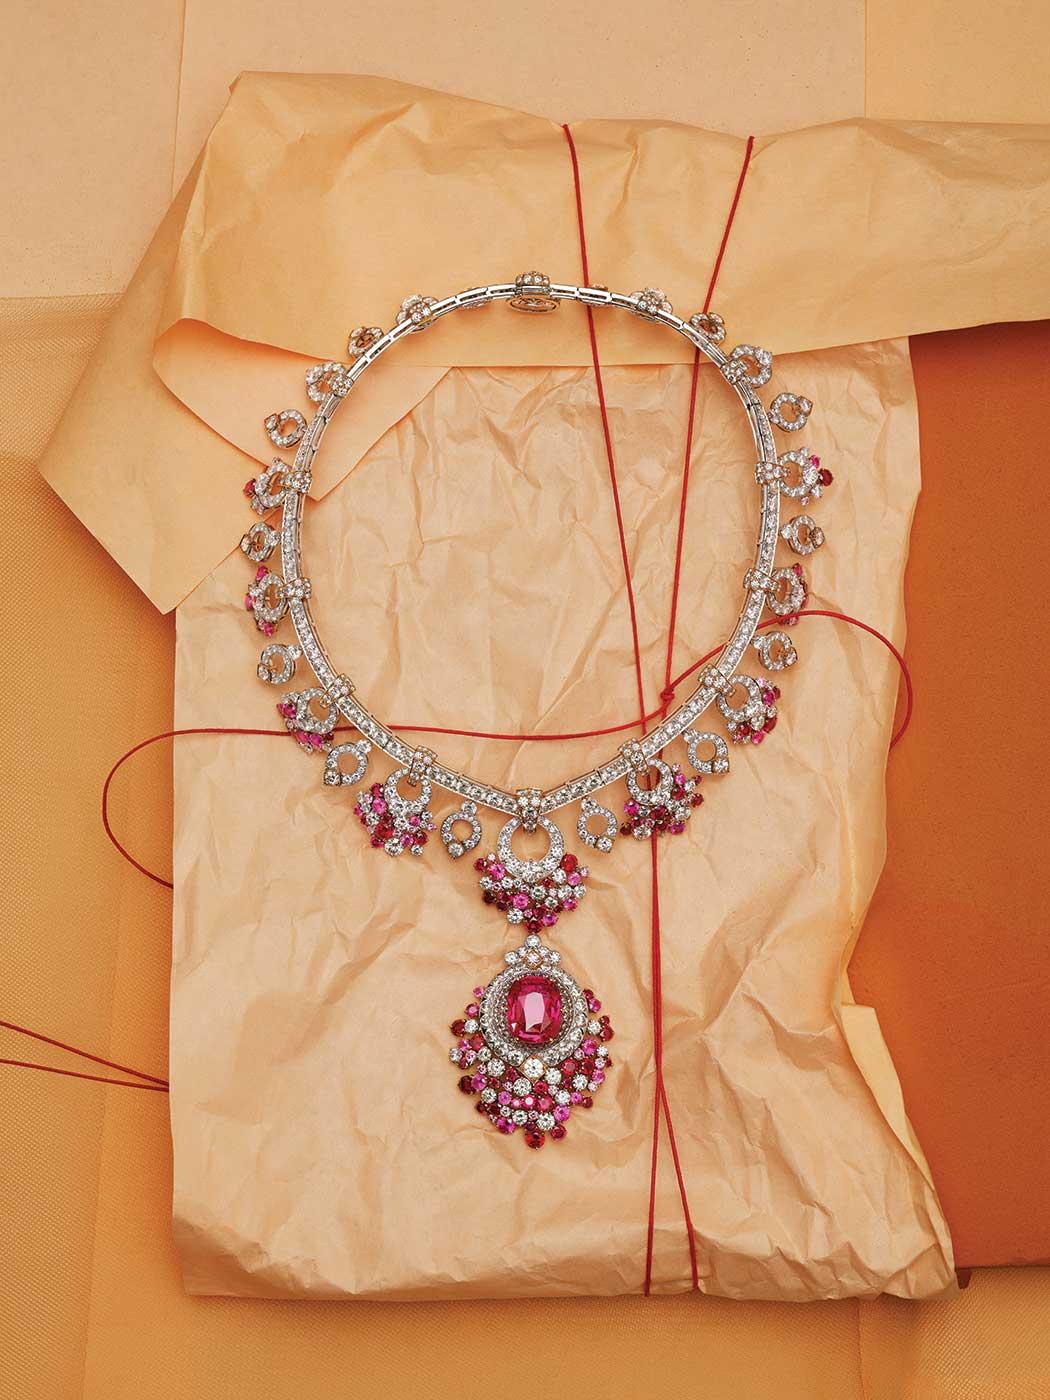 191029-WSJ-Spring20-Jewelry_Box-Van_Cleef_19198_v2_CMYK_QC